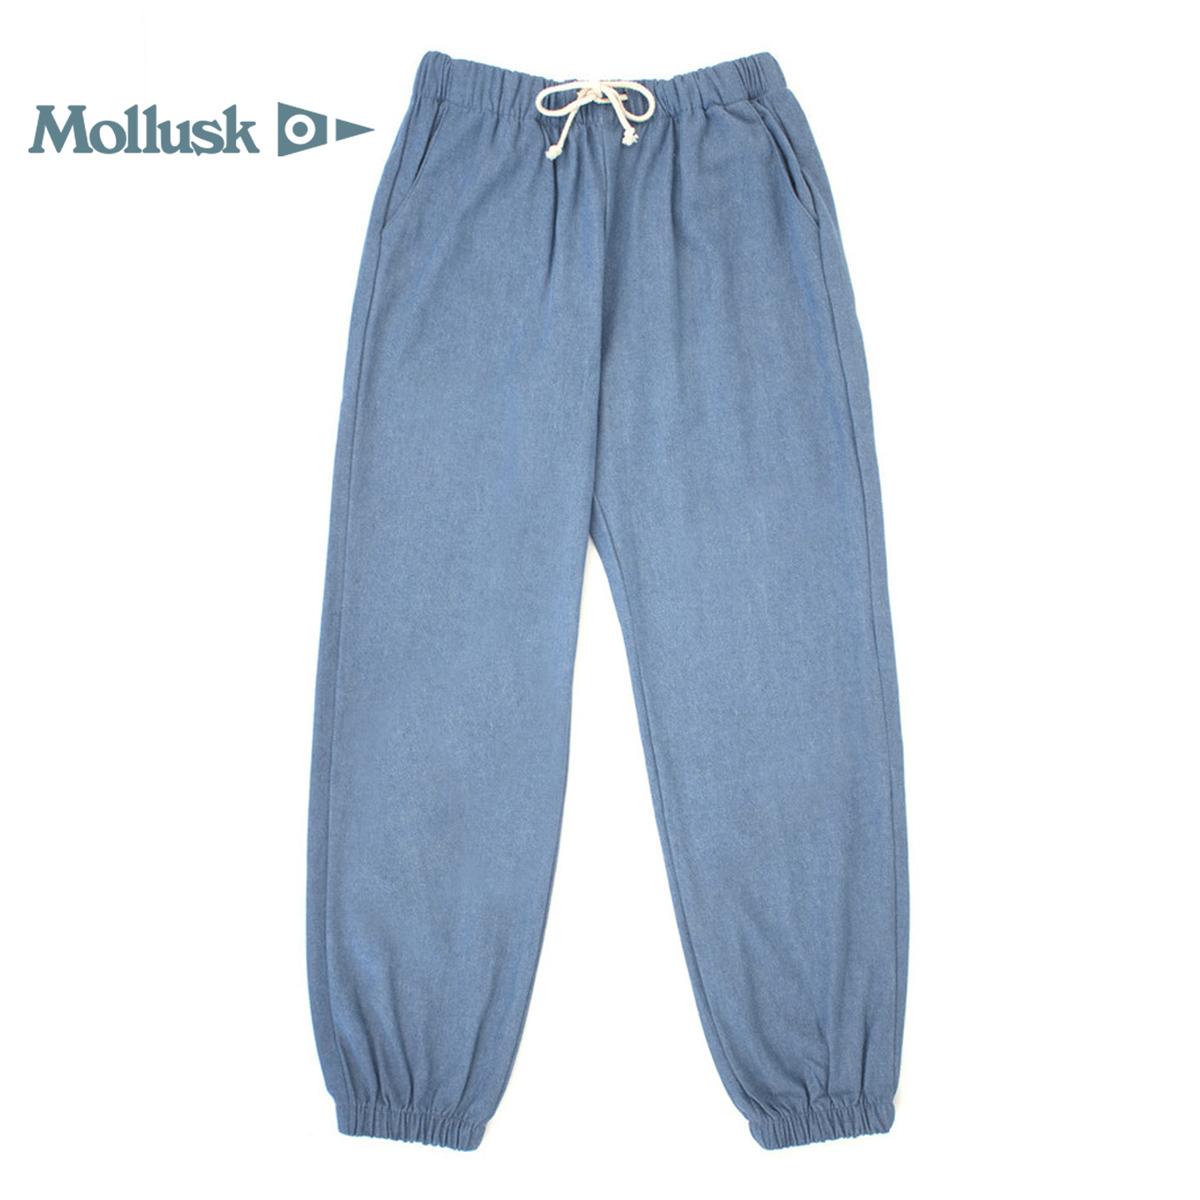 Mollusk Surf Shop モラスクサーフショップ Beach Pants